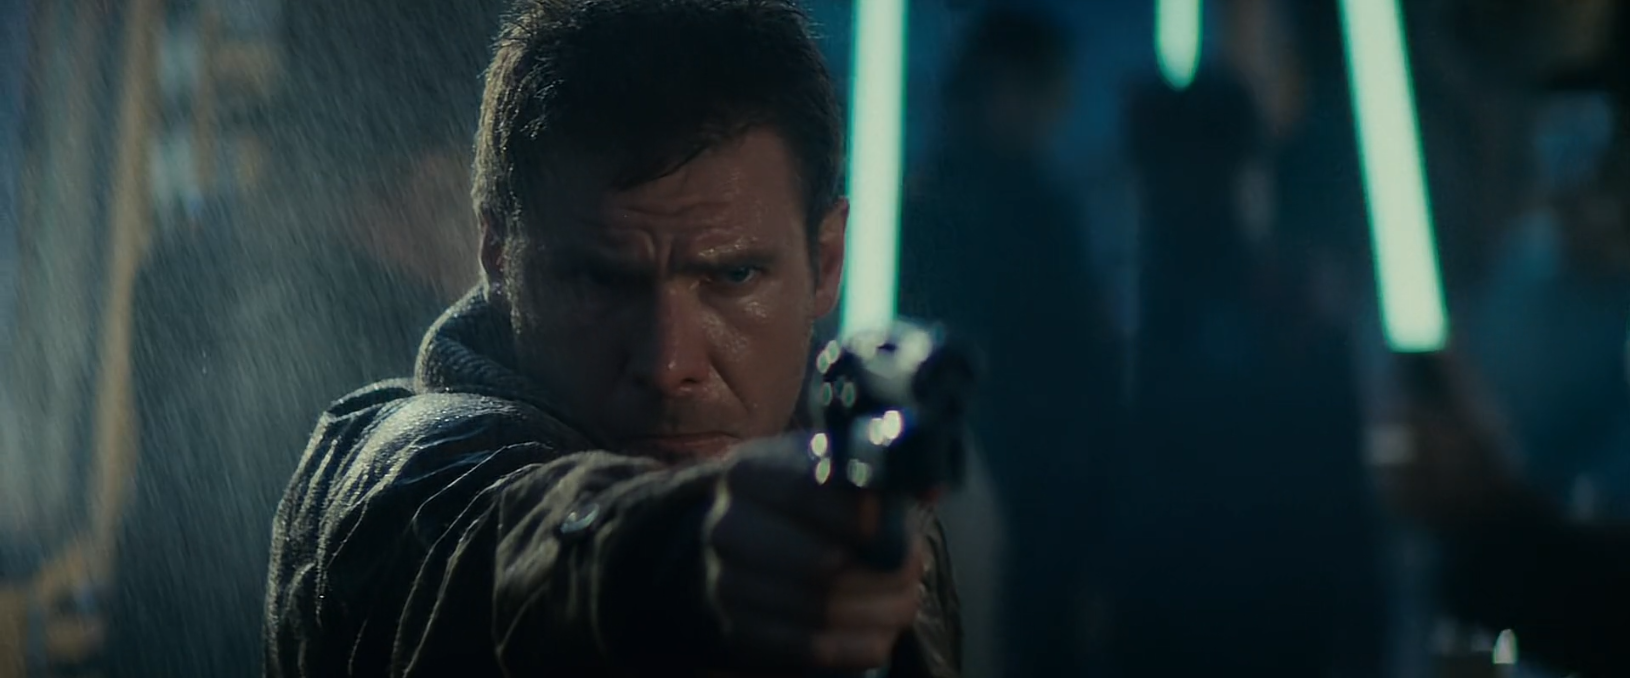 Blade Runner - Harrison Ford as Deckard